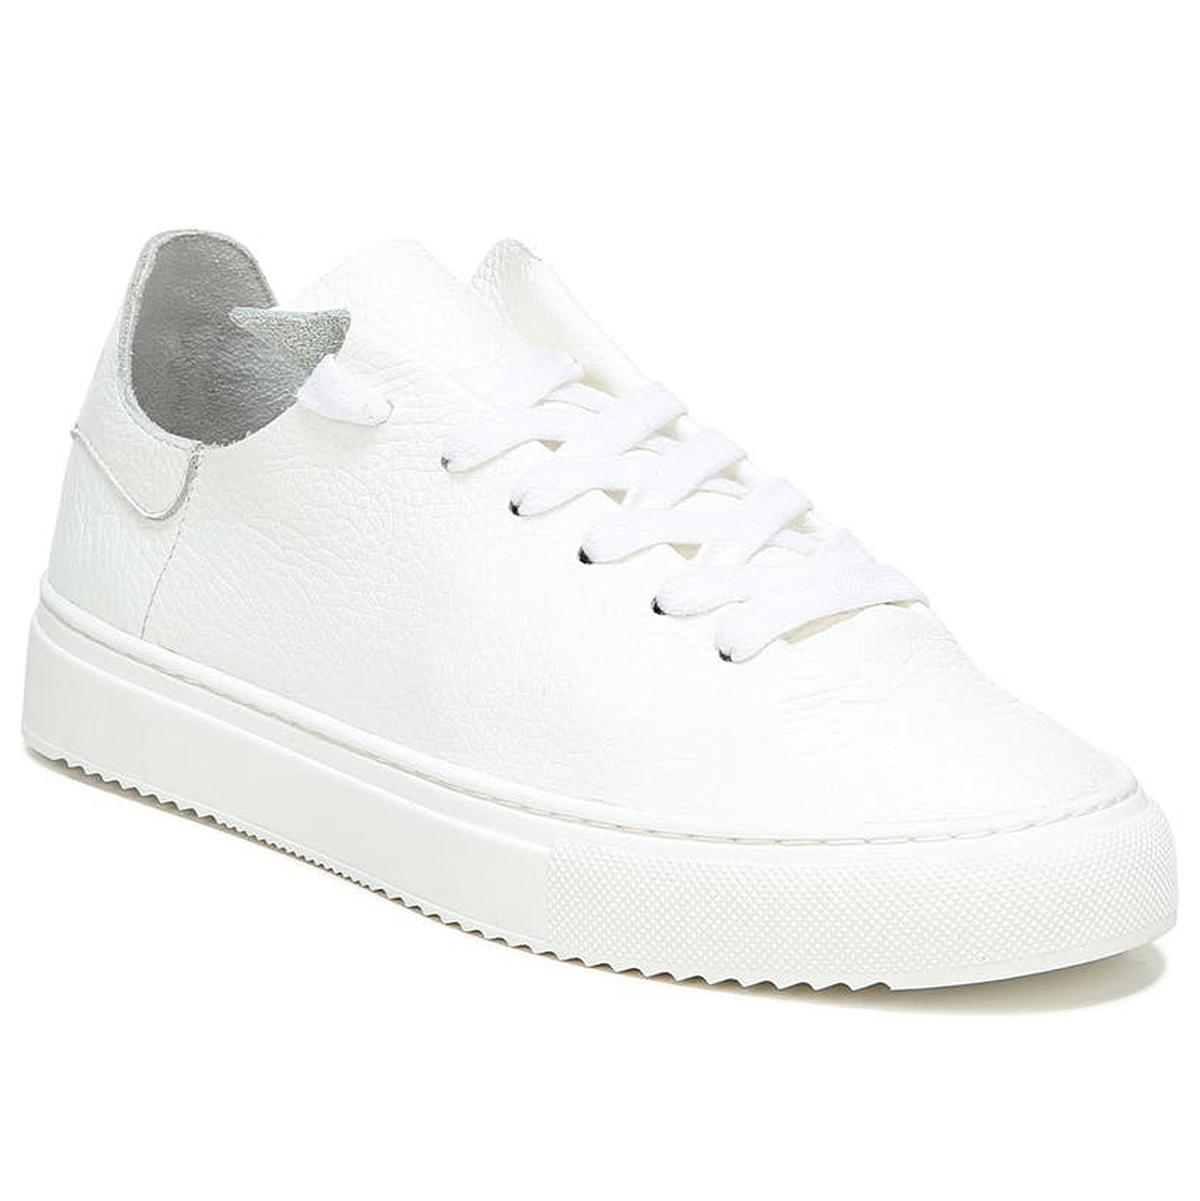 nordstrom-anniversary-sale-sneakers